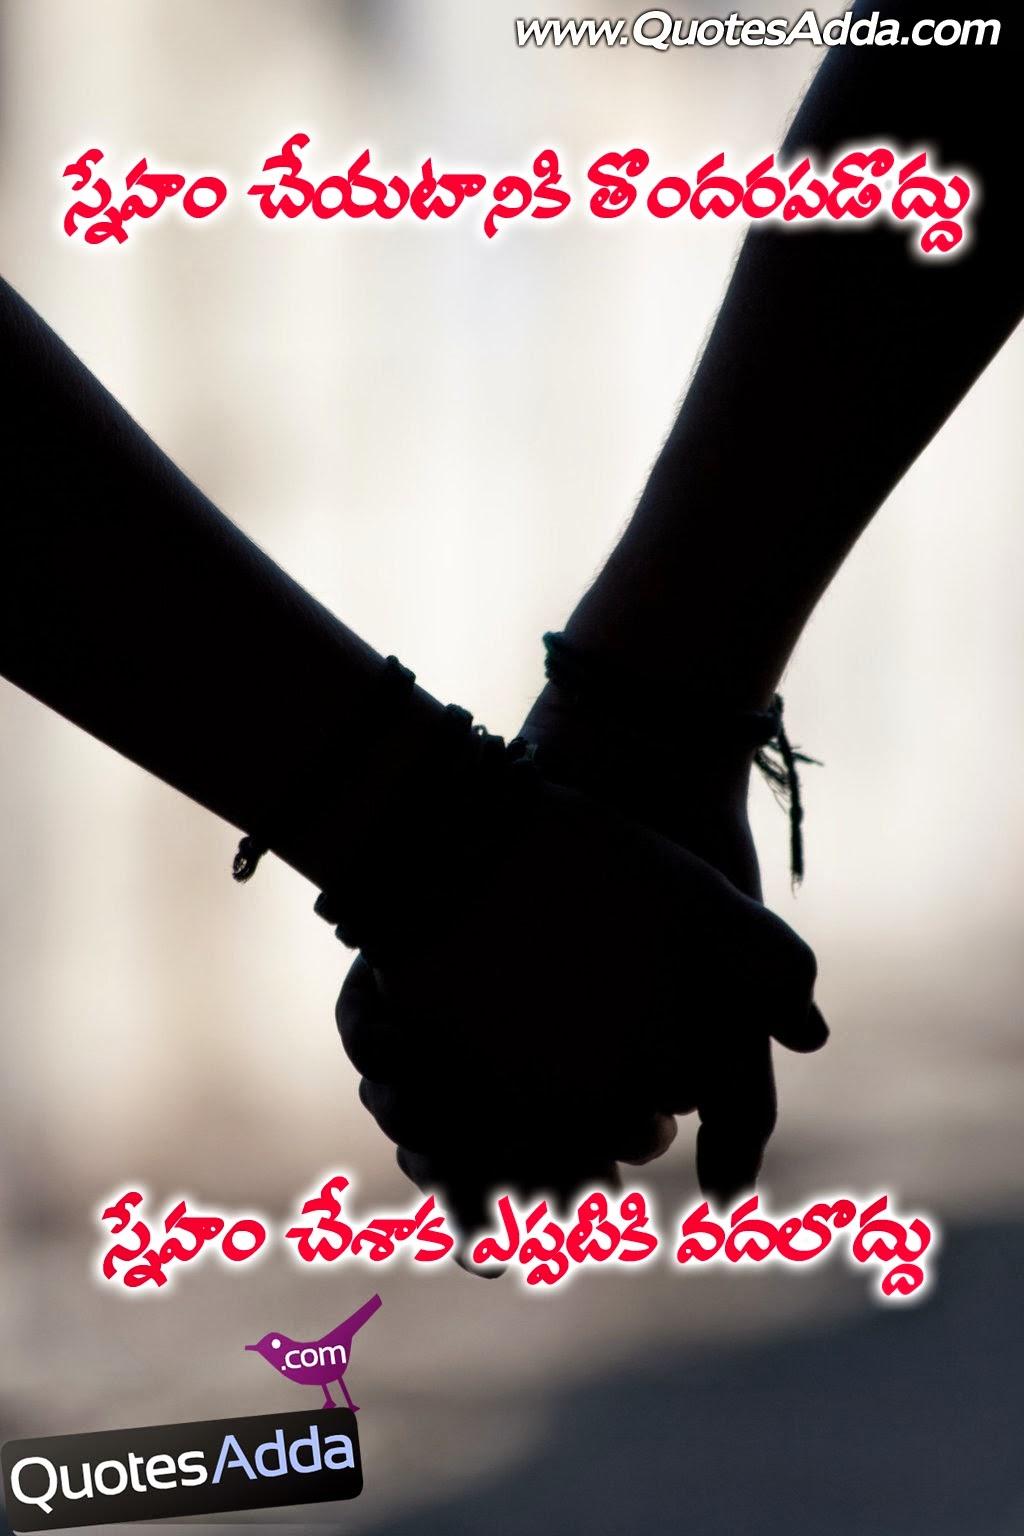 Happy Friendship Day} Friendship Quotes In Telugu Photos,Pics